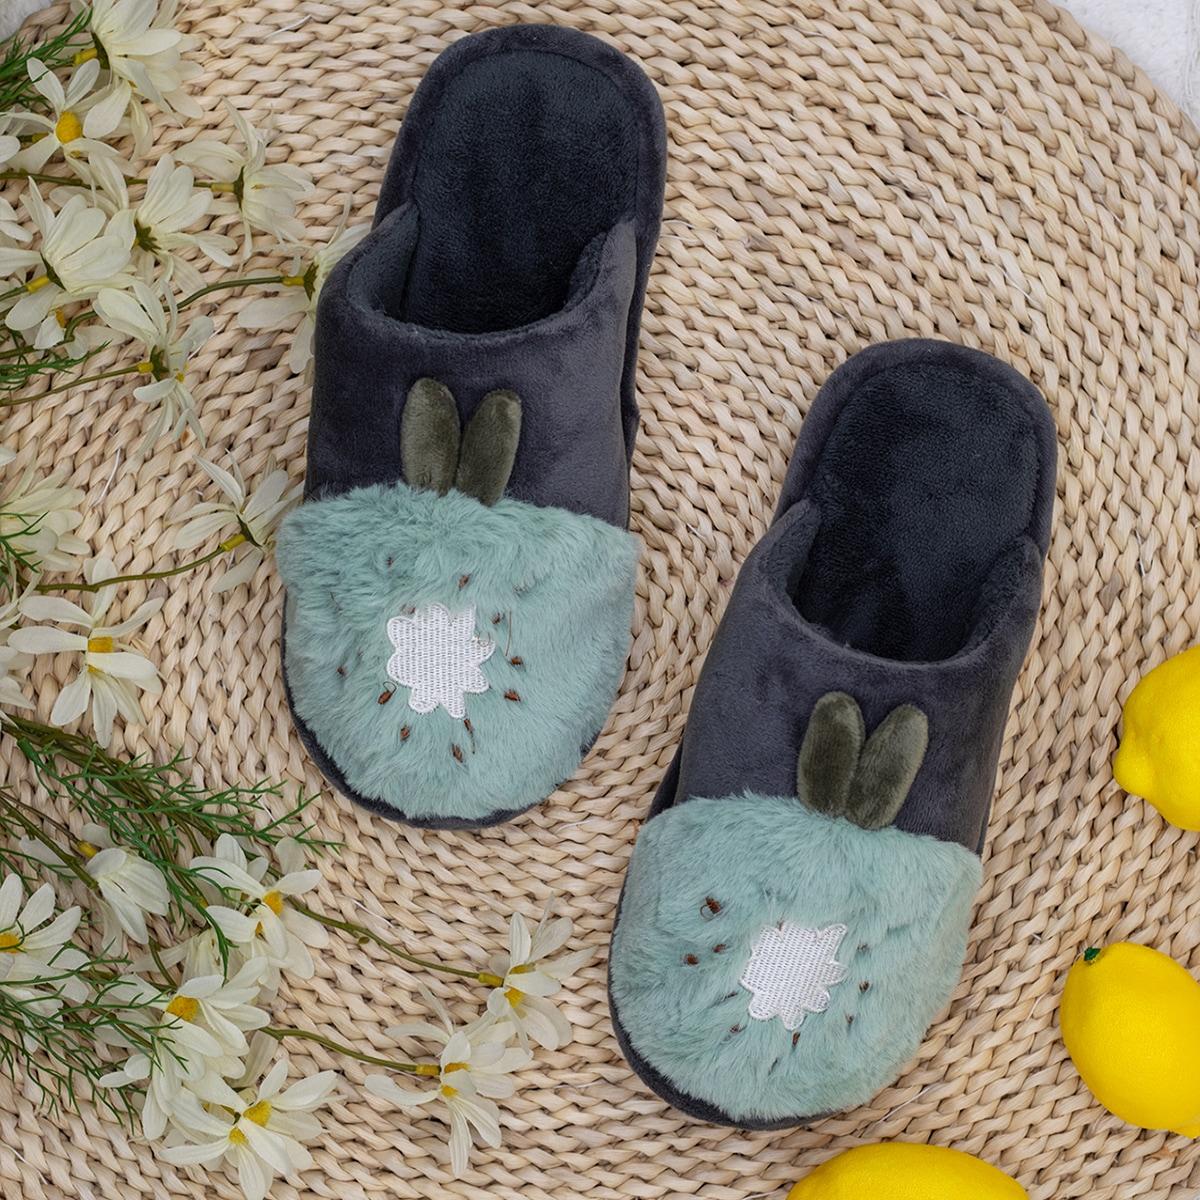 shein Kleurblok Heren slippers